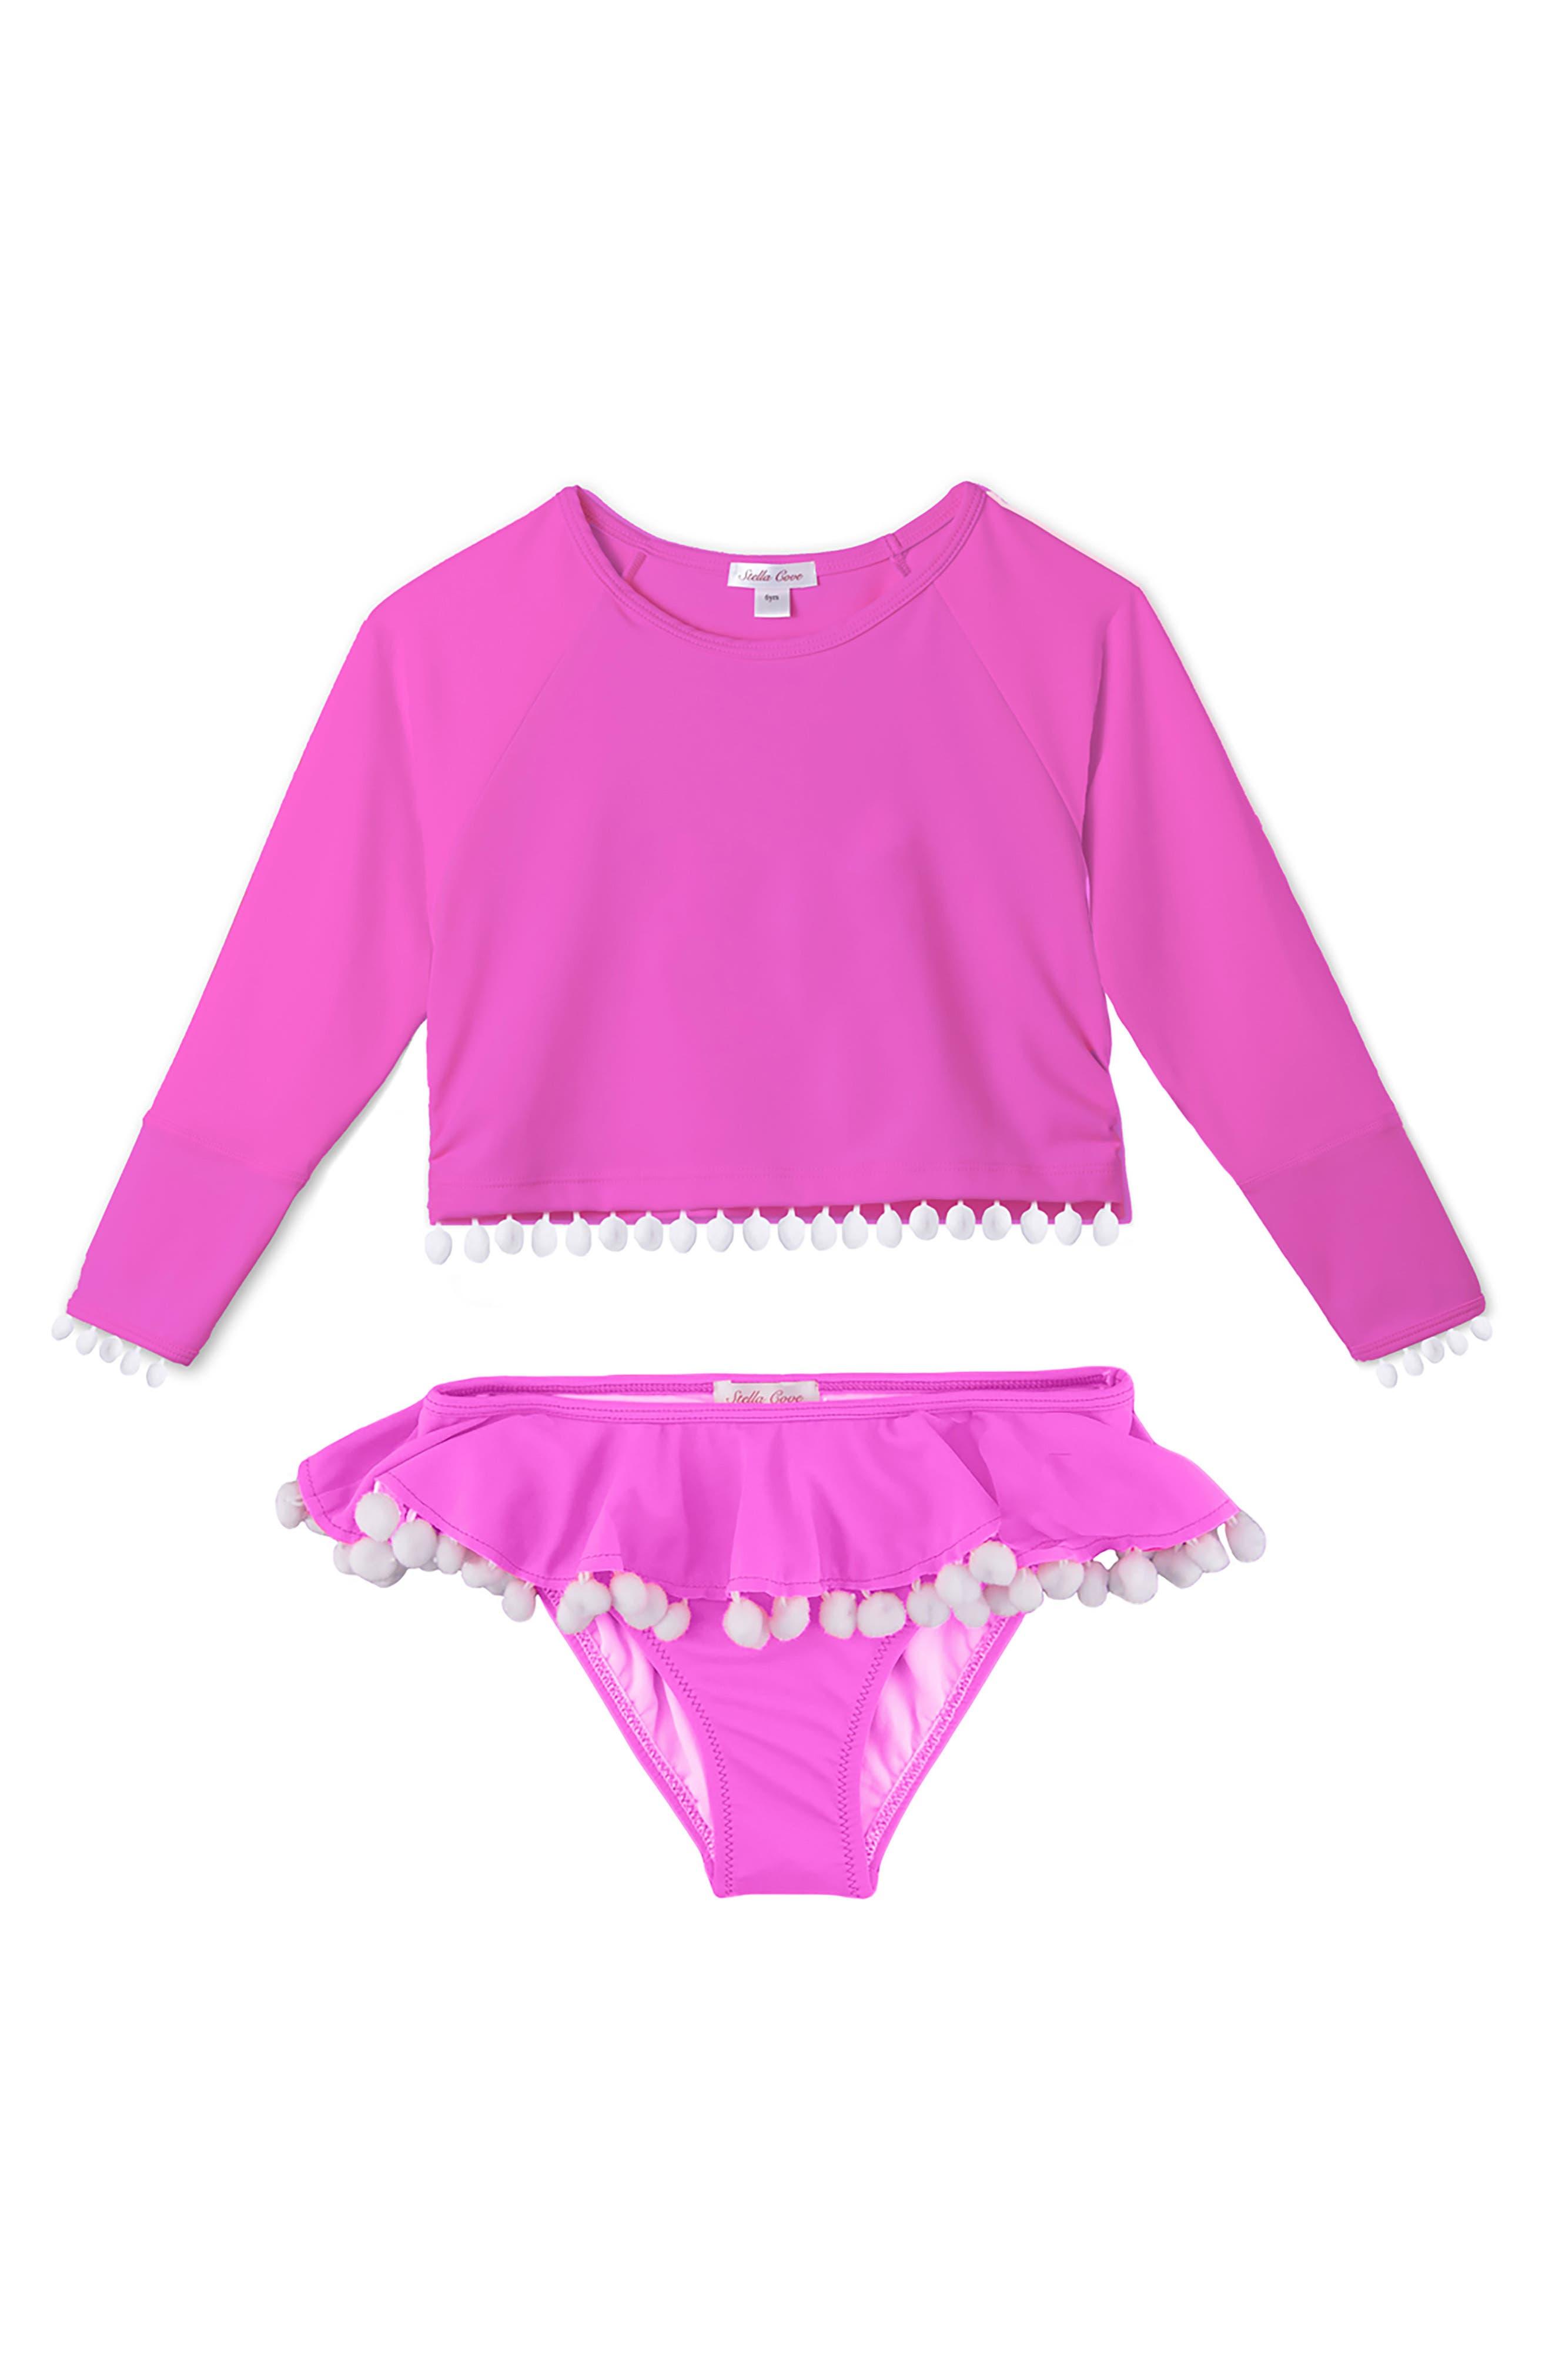 Main Image - Stella Cove Pompom Rashguard Two-Piece Swimsuit (Big Girls)